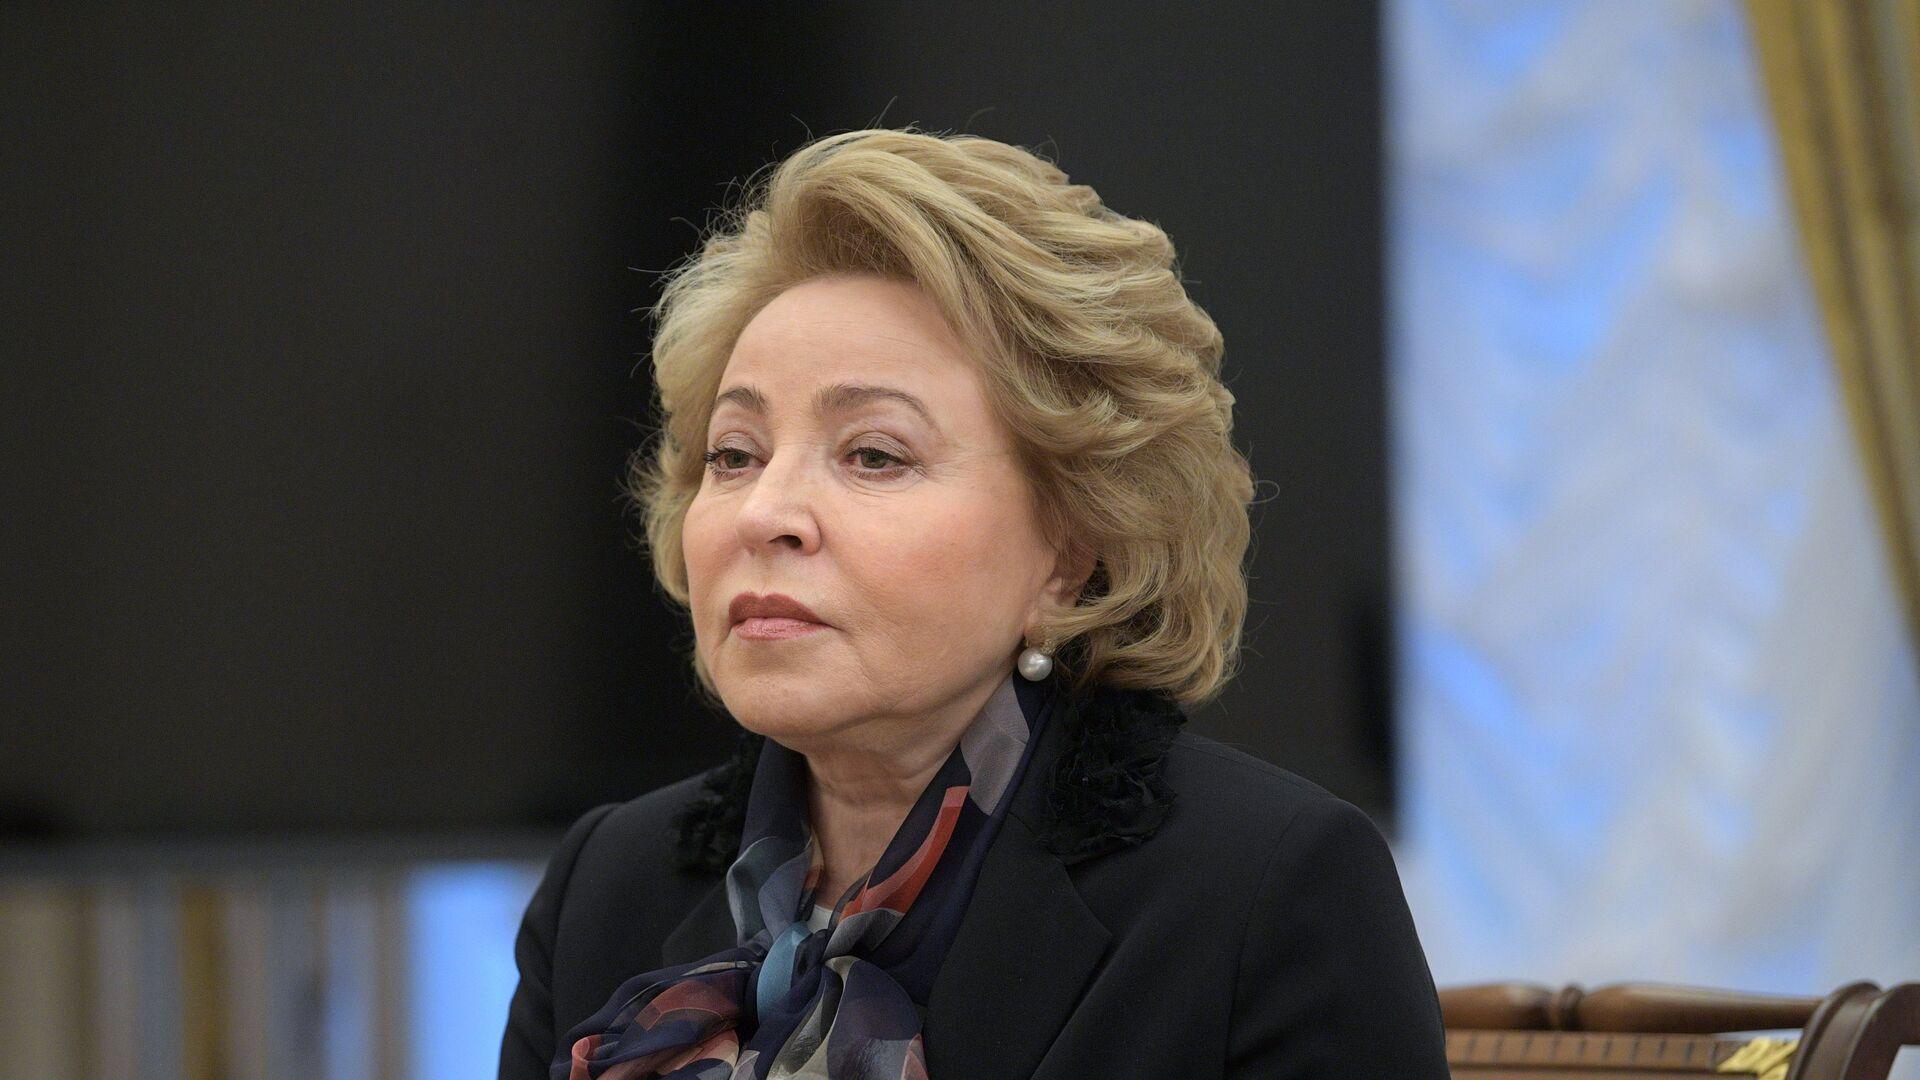 Valentina Matvienko, presidenta del Consejo de la Federación (Senado) ruso - Sputnik Mundo, 1920, 07.09.2021